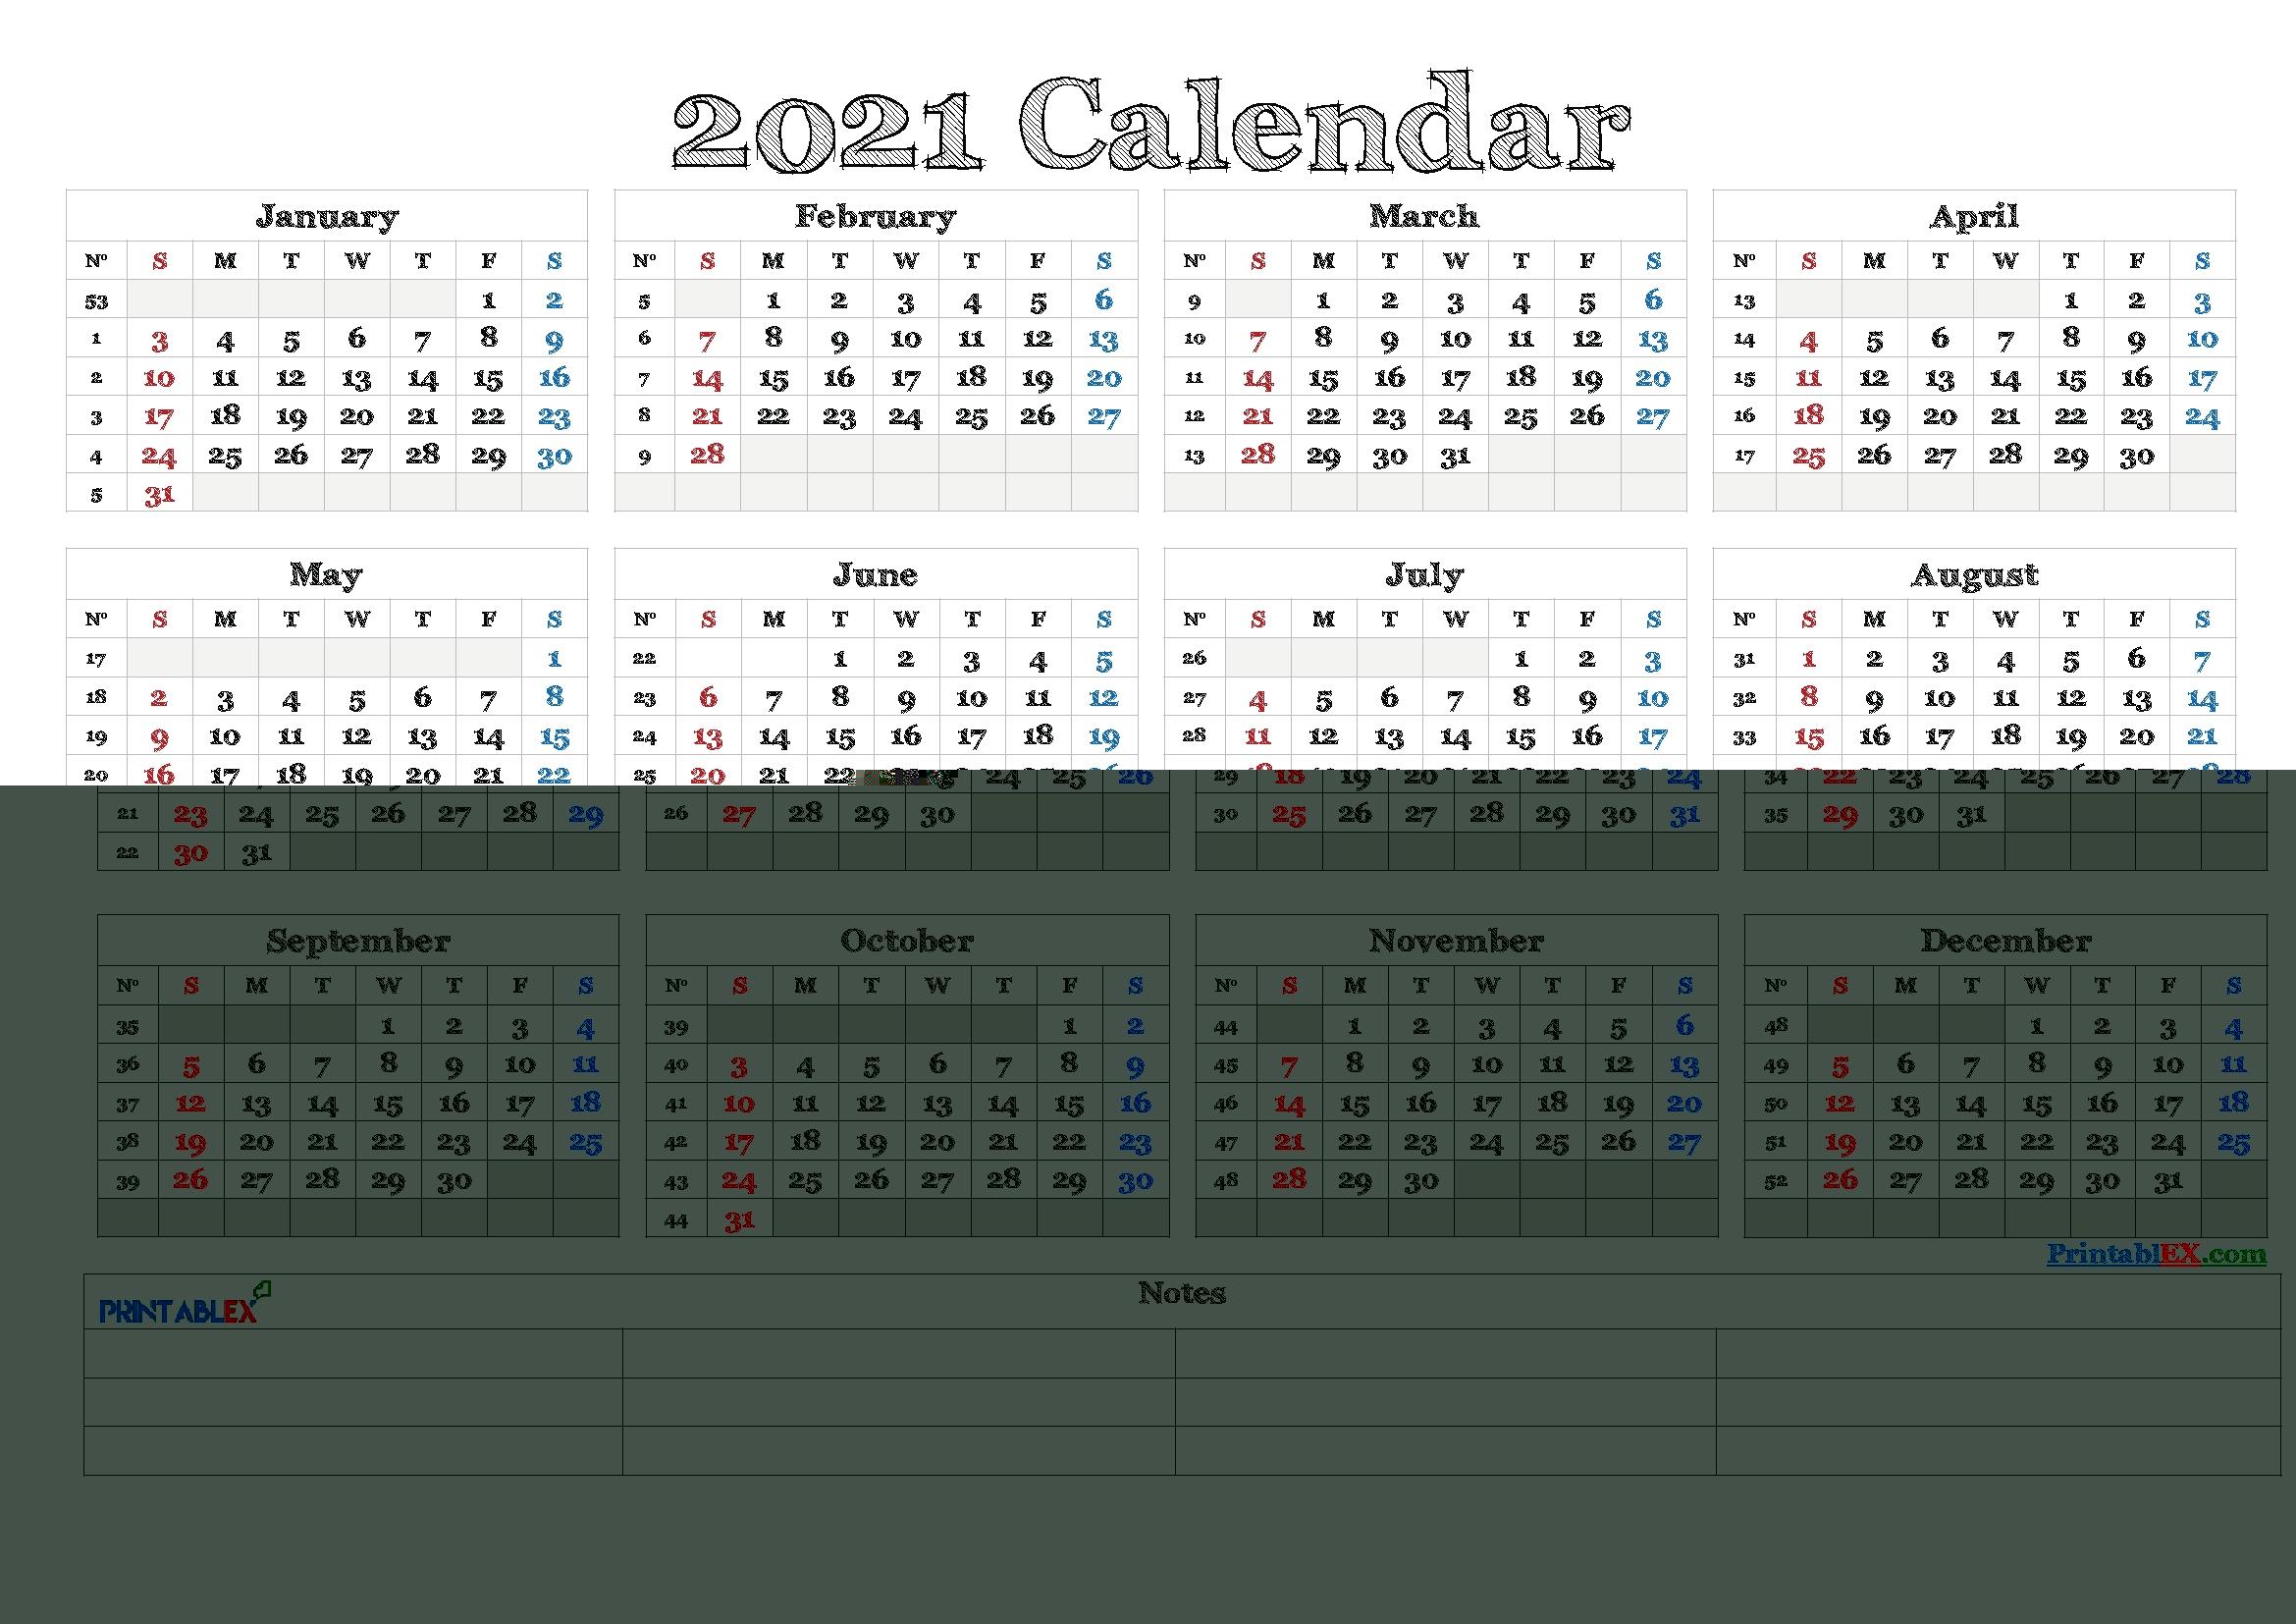 Free Editable Weekly 2021 Calendar / 2021 Editable Yearly